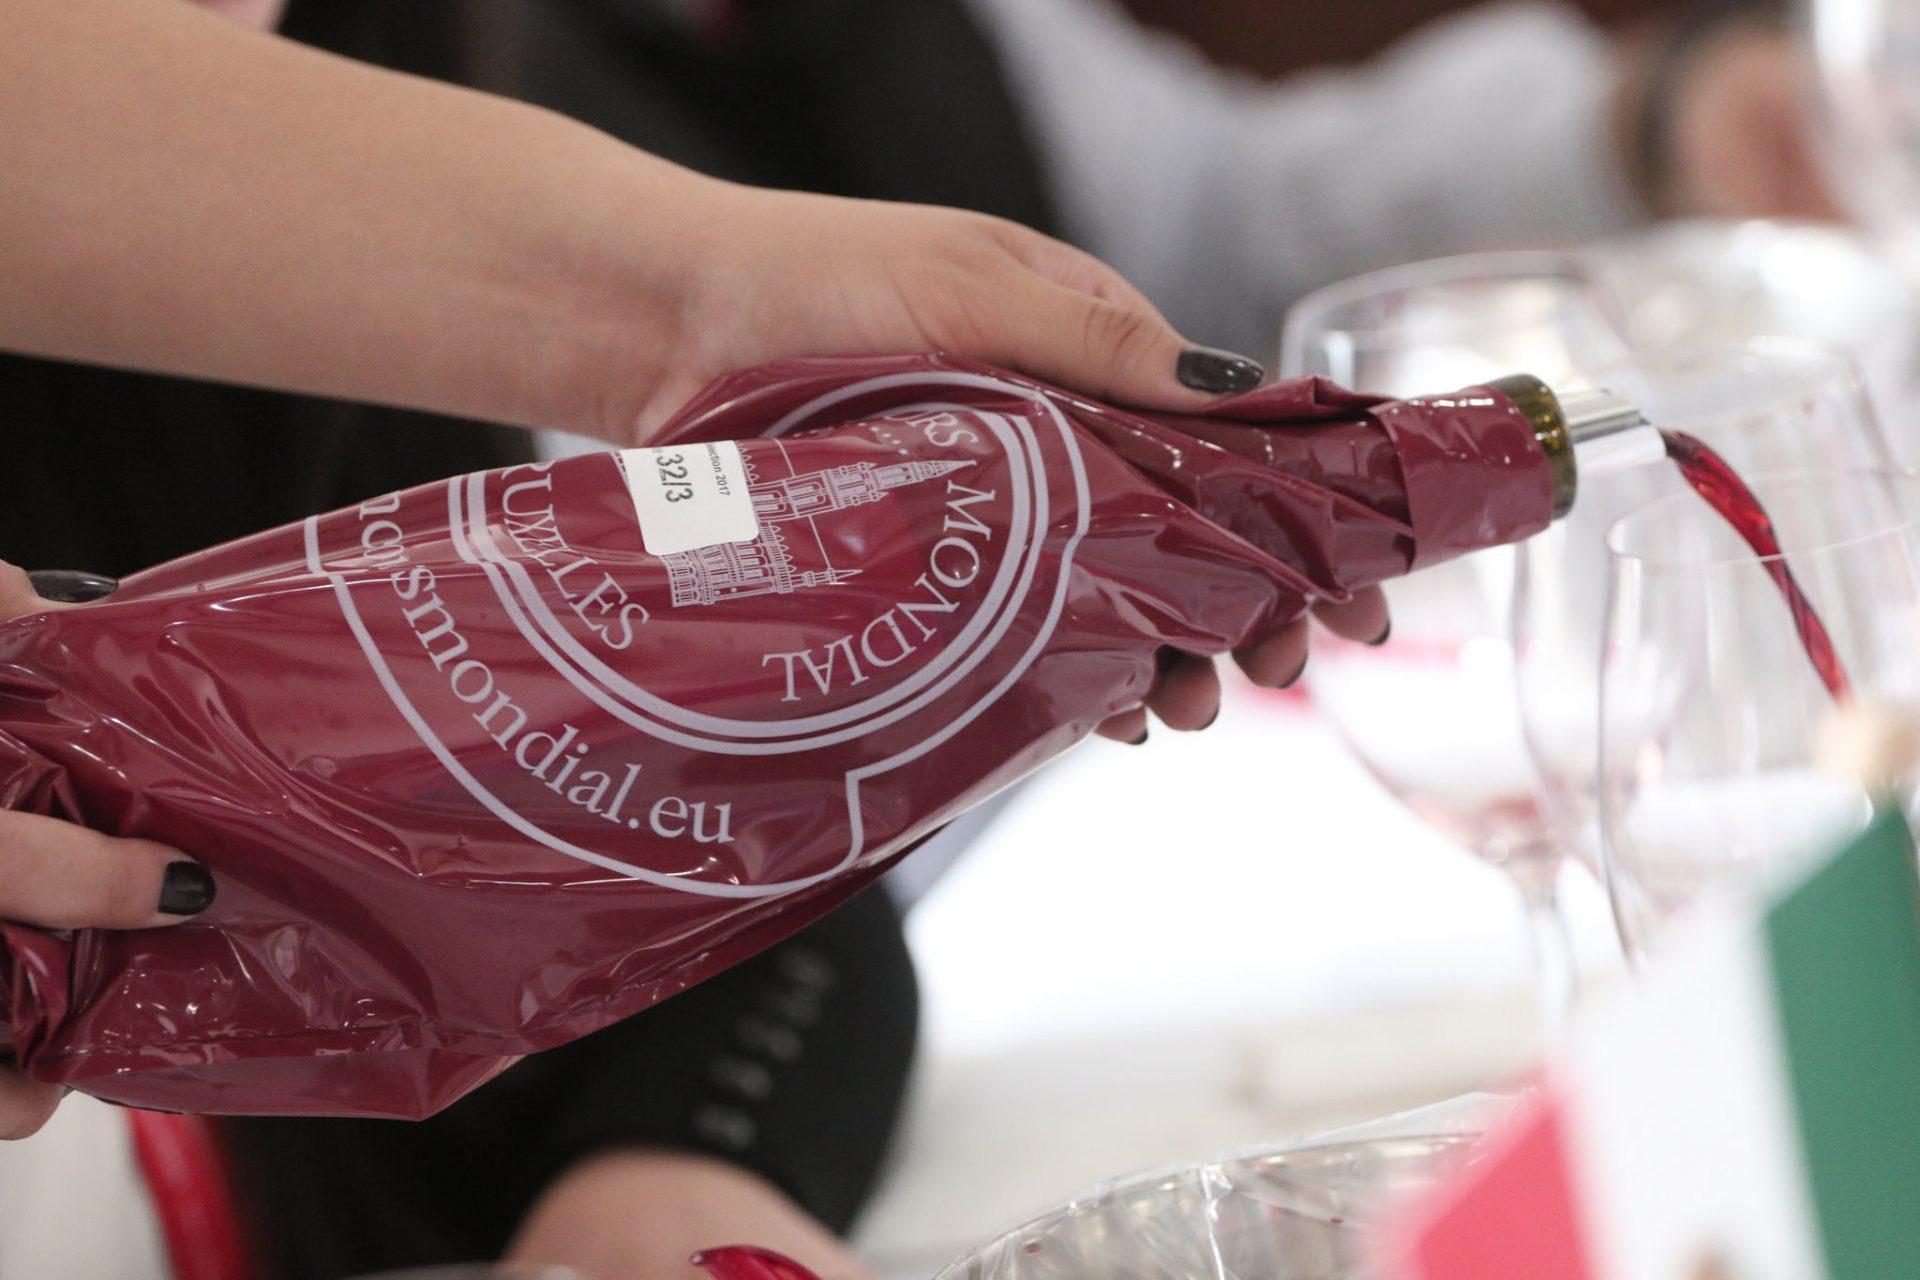 Concours Mondial de Bruxelles premia a más de 100 bebidas mexicanas